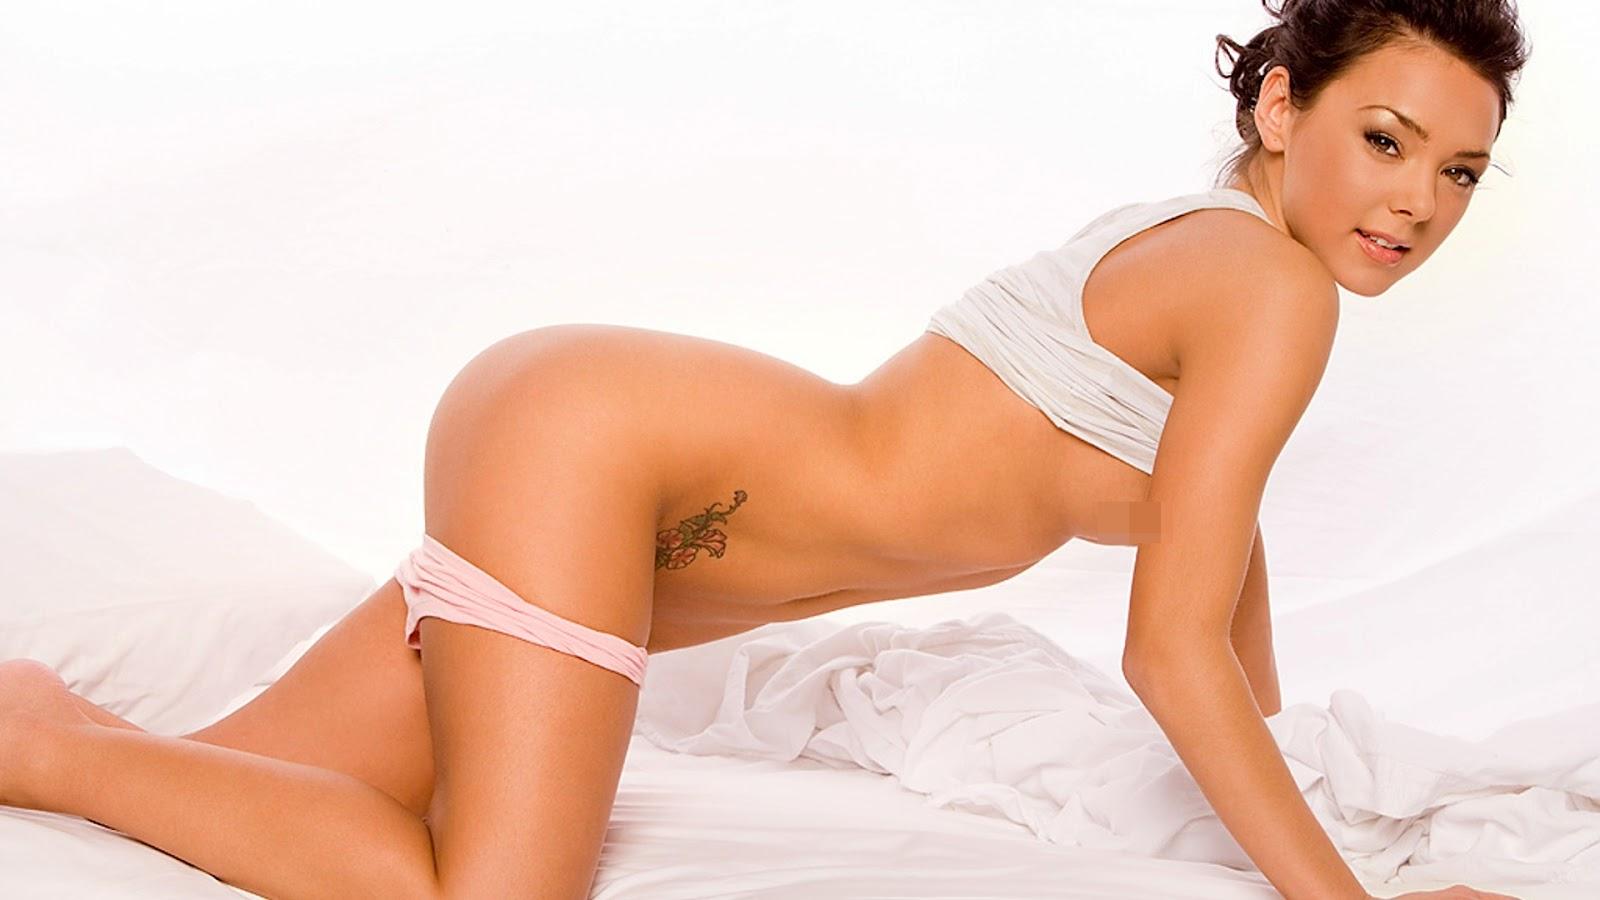 Lanes8 PS3 Themes: Girls of Playboy v.02 HD/SD (slideshow)